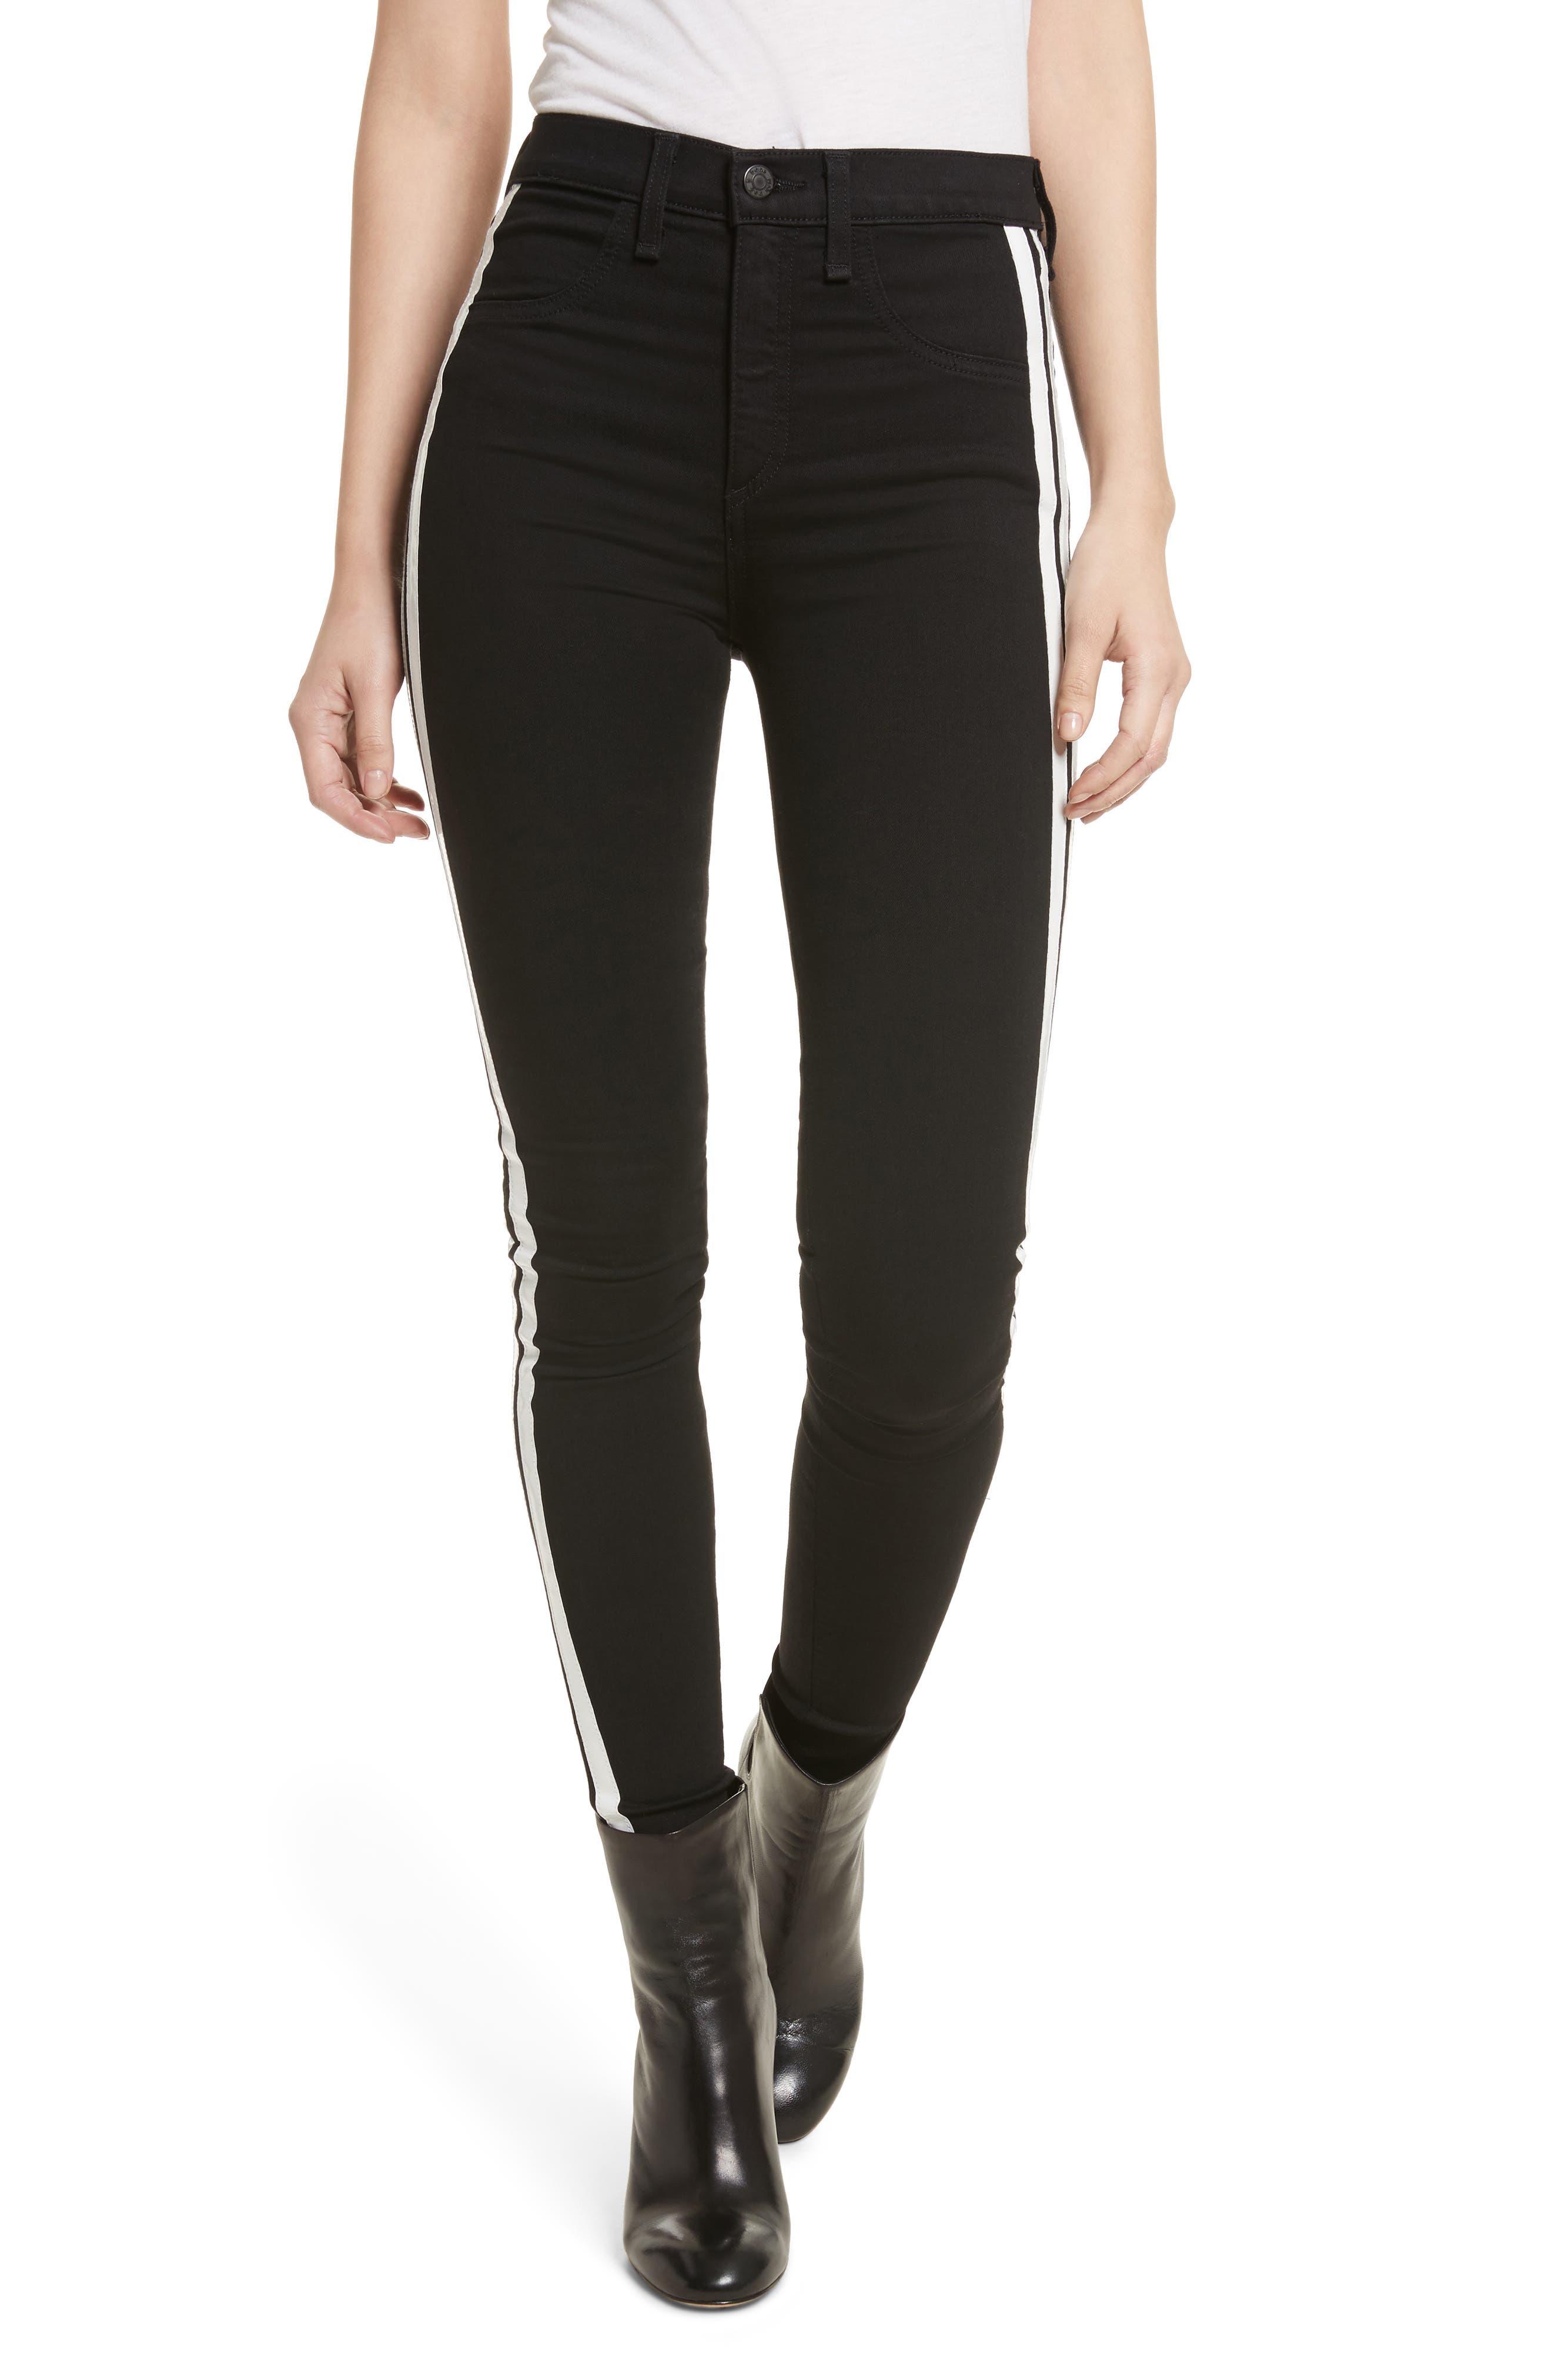 Mito High Waist Skinny Jeans,                             Main thumbnail 1, color,                             001